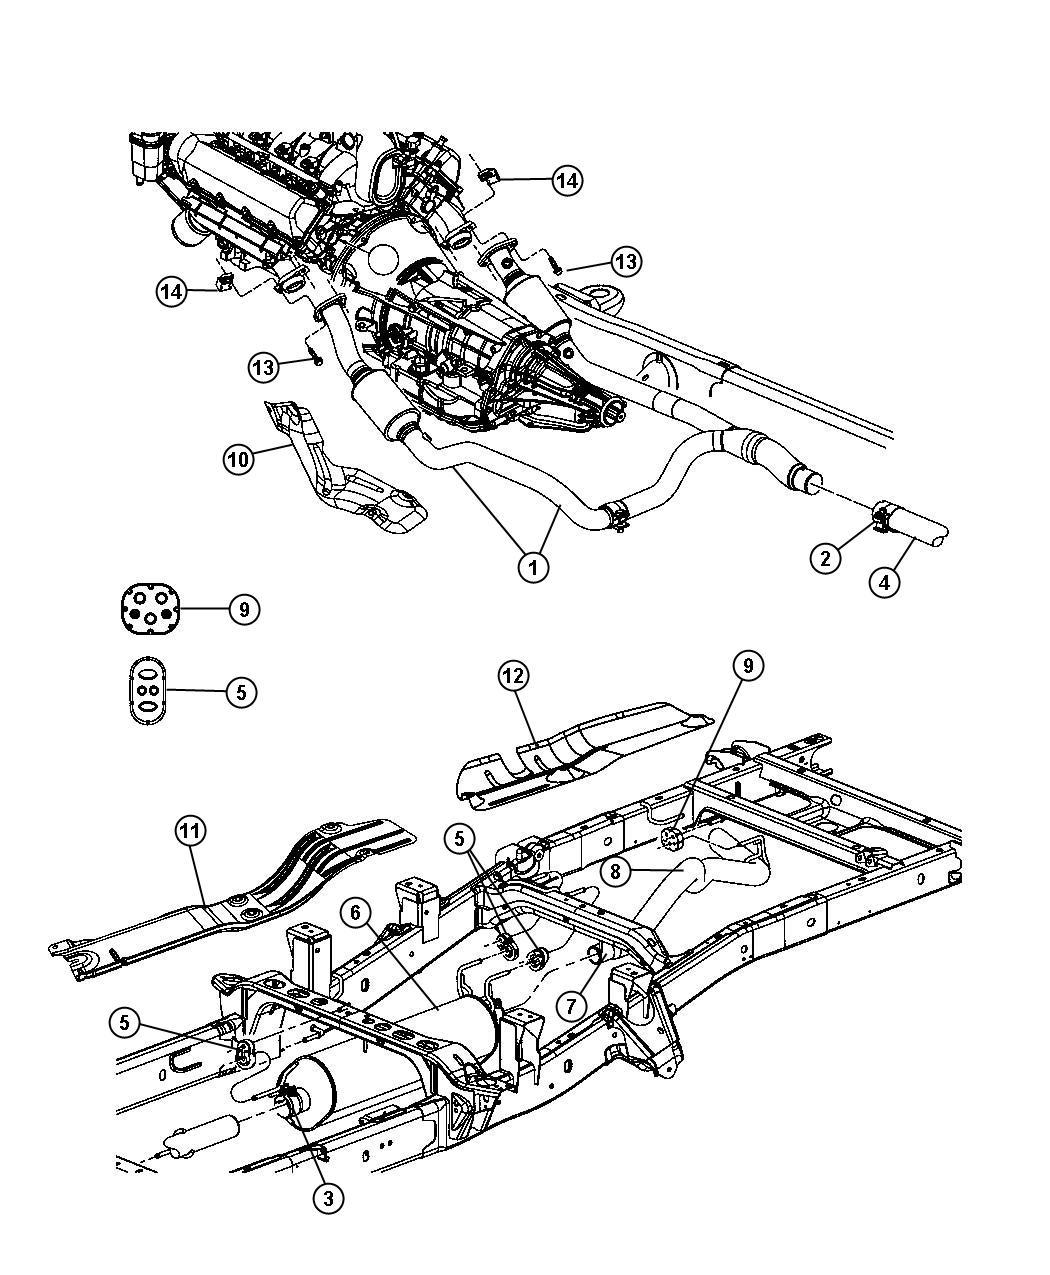 Dodge Dakota Clamp Exhaust Extension Pipe To Muffler